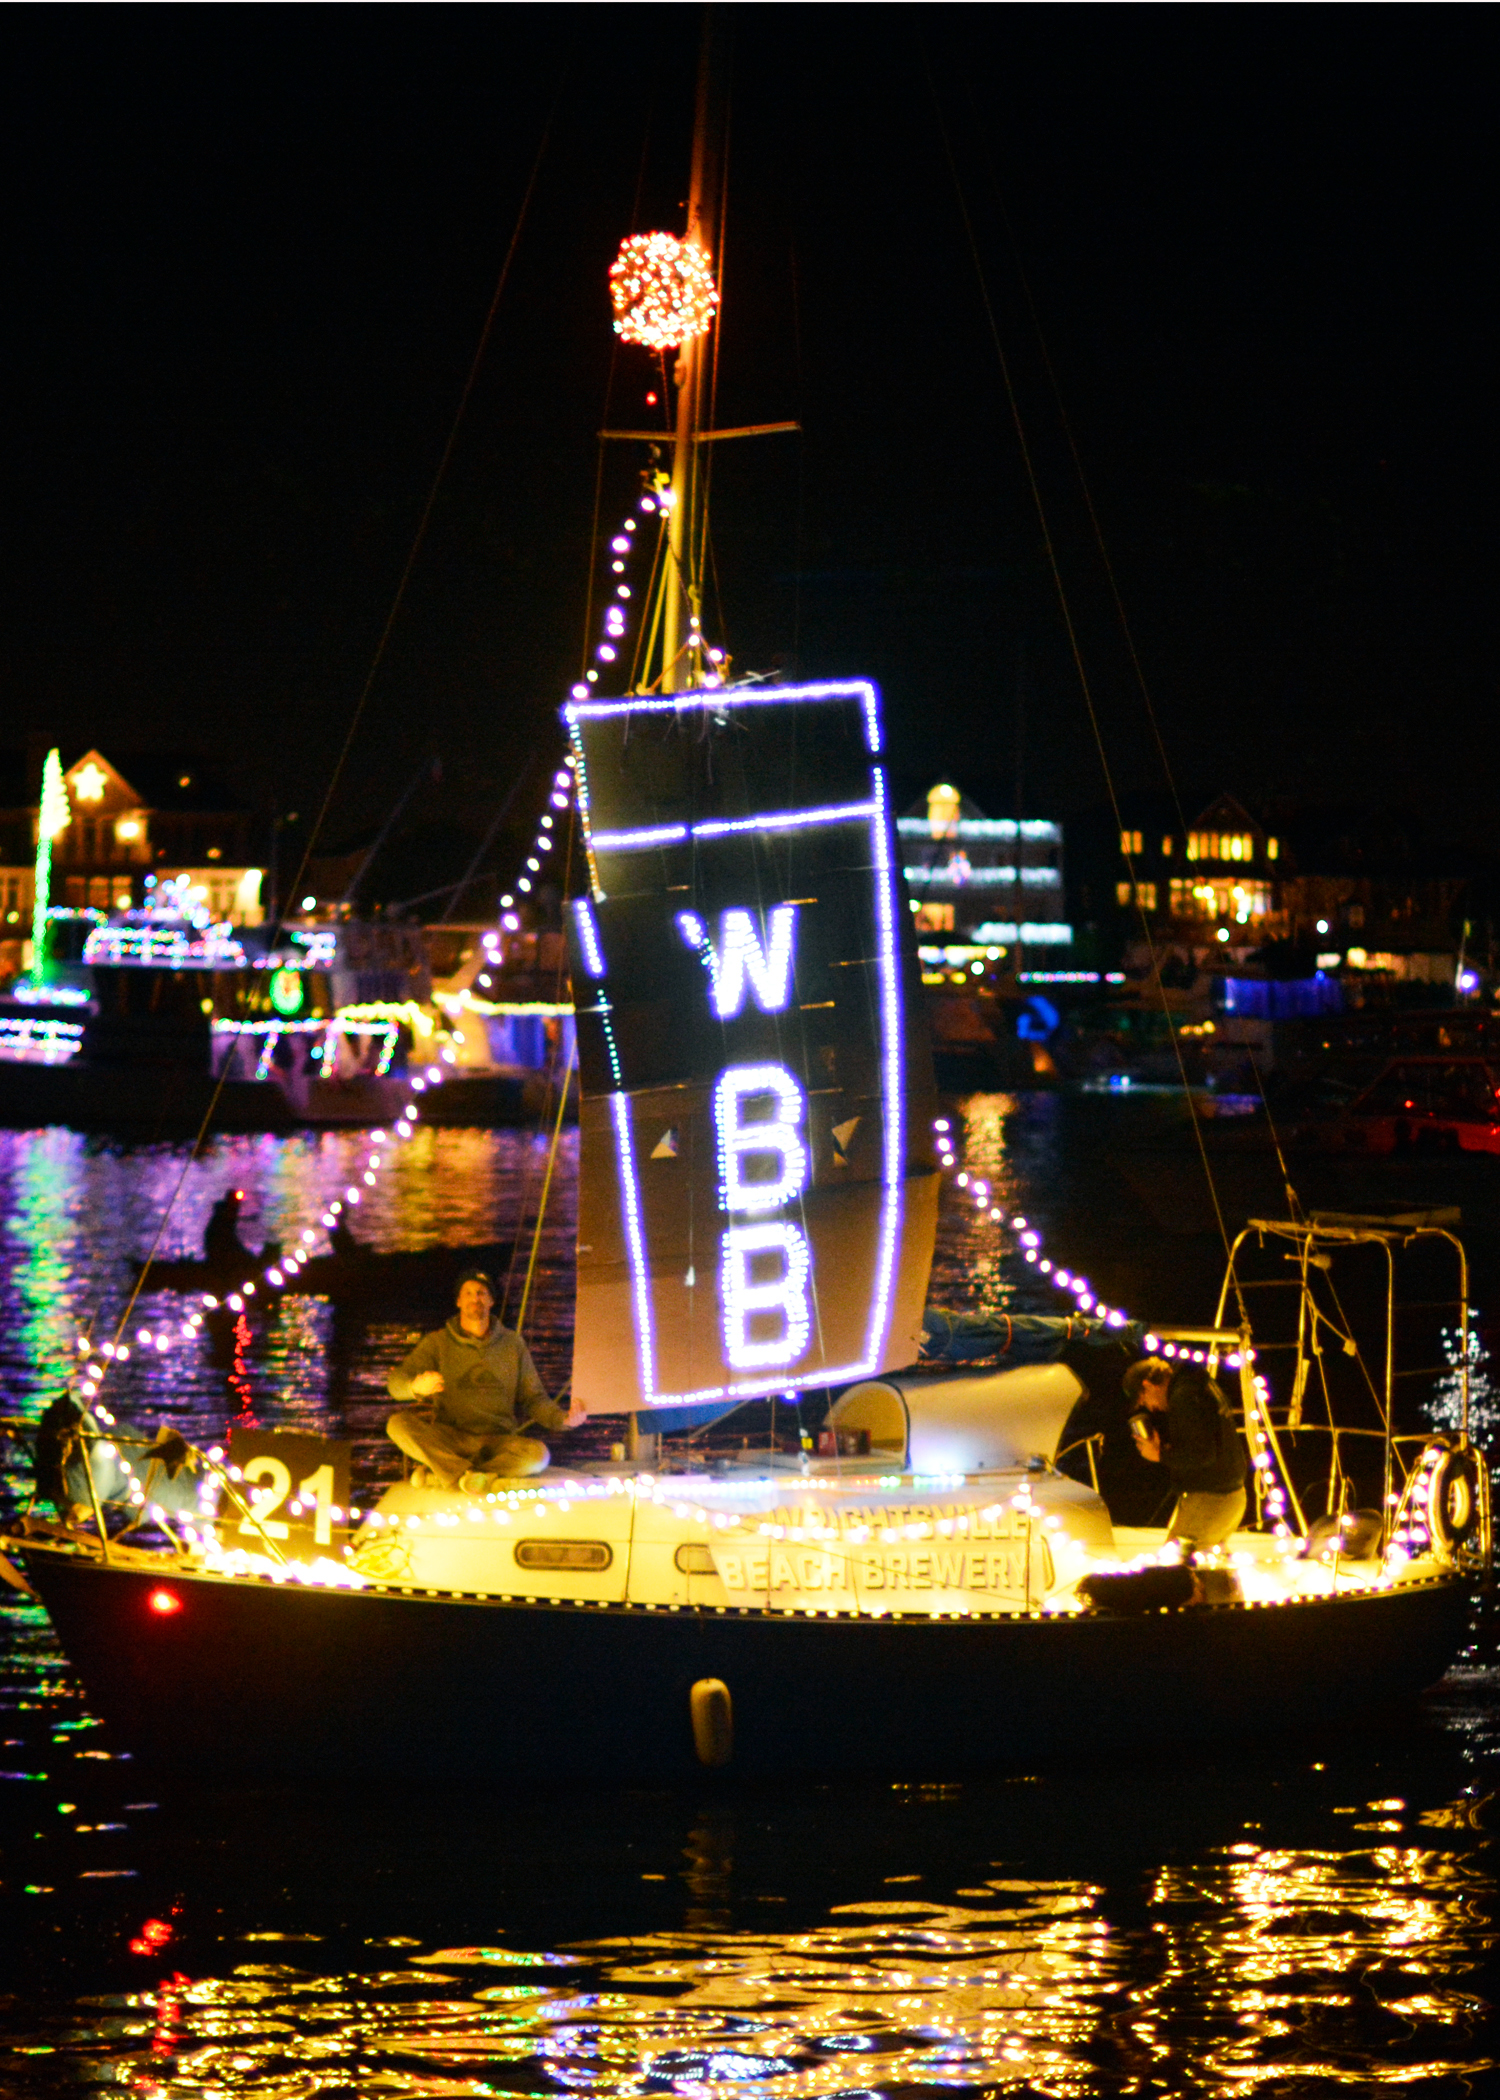 "<div class=""meta image-caption""><div class=""origin-logo origin-image none""><span>none</span></div><span class=""caption-text"">2017 NC Holiday Flotilla Best Sailboat Award winner (Credit: Beth W. Hedgepeth)</span></div>"